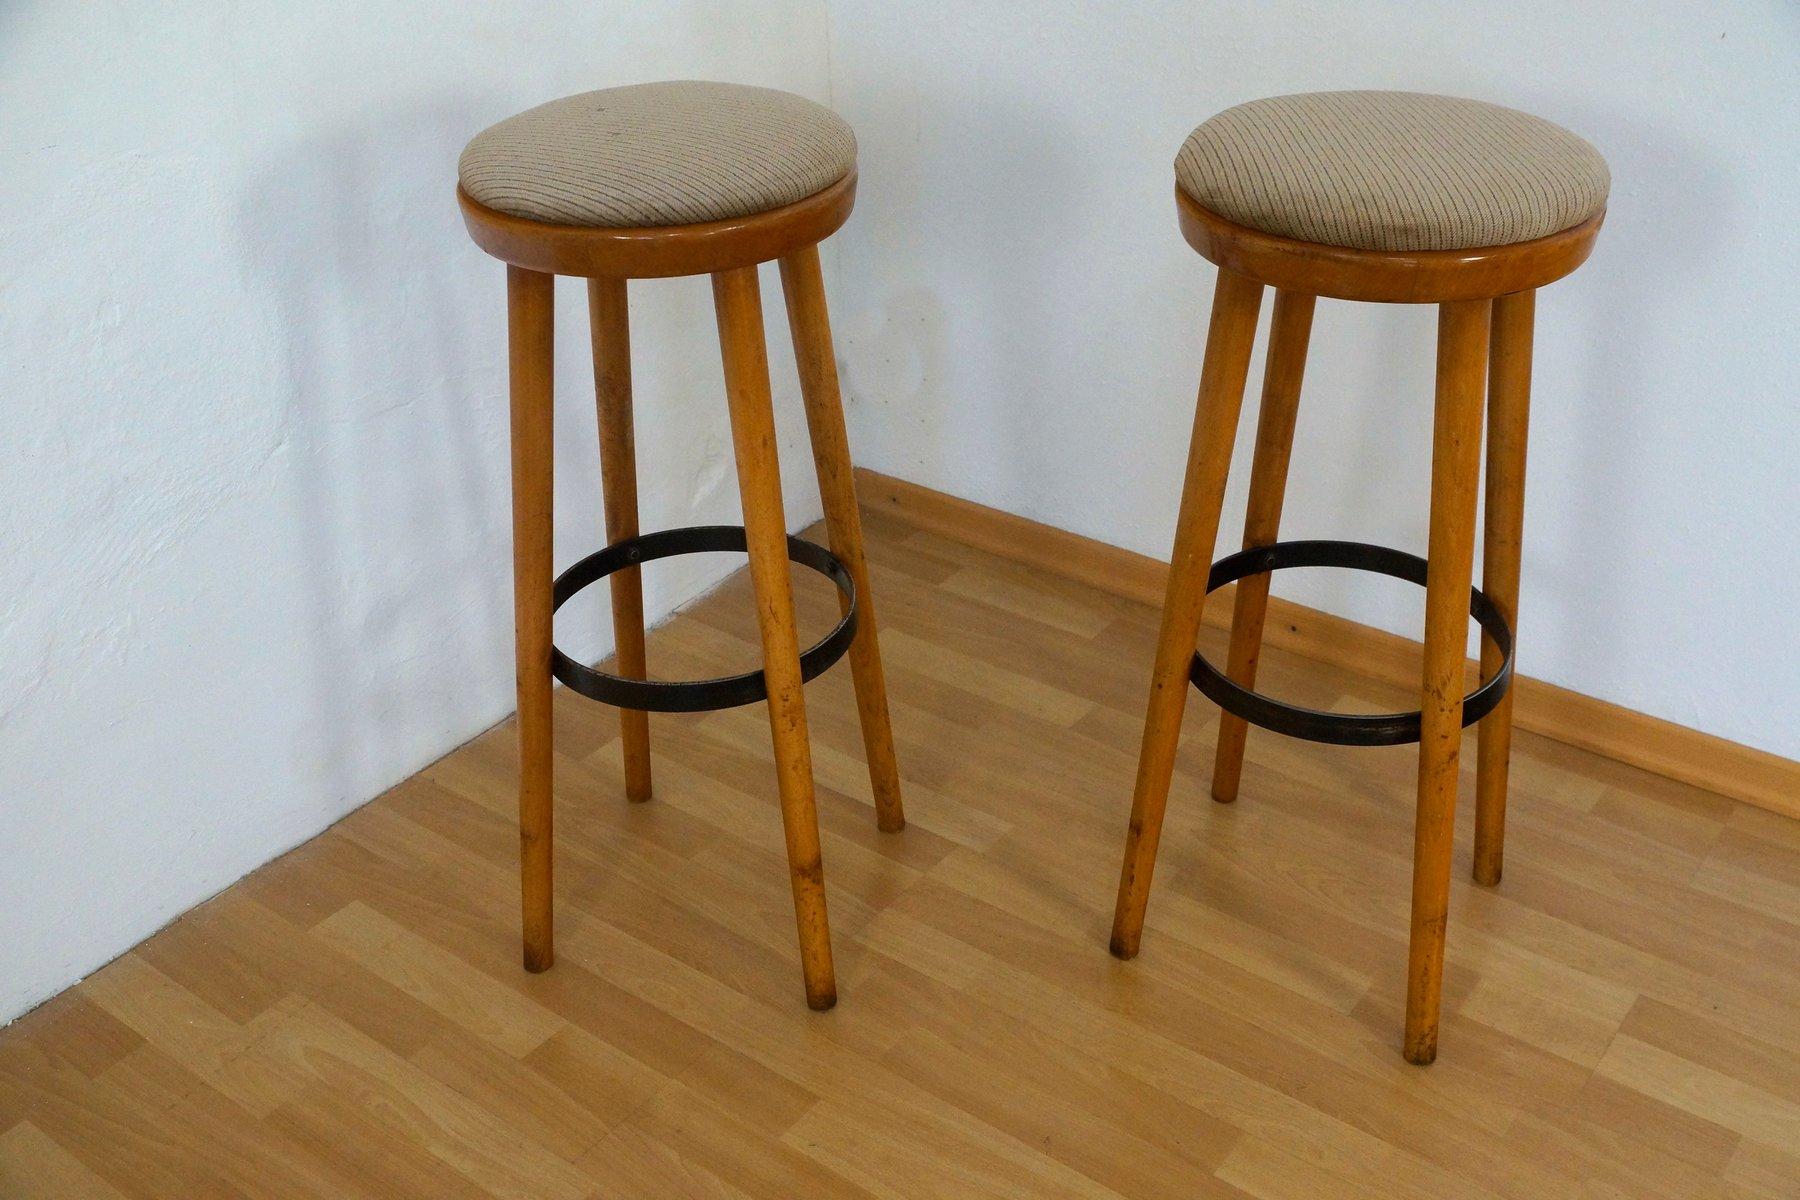 german bar stools from spahn m bel 1960s set of 2 for sale at pamono. Black Bedroom Furniture Sets. Home Design Ideas